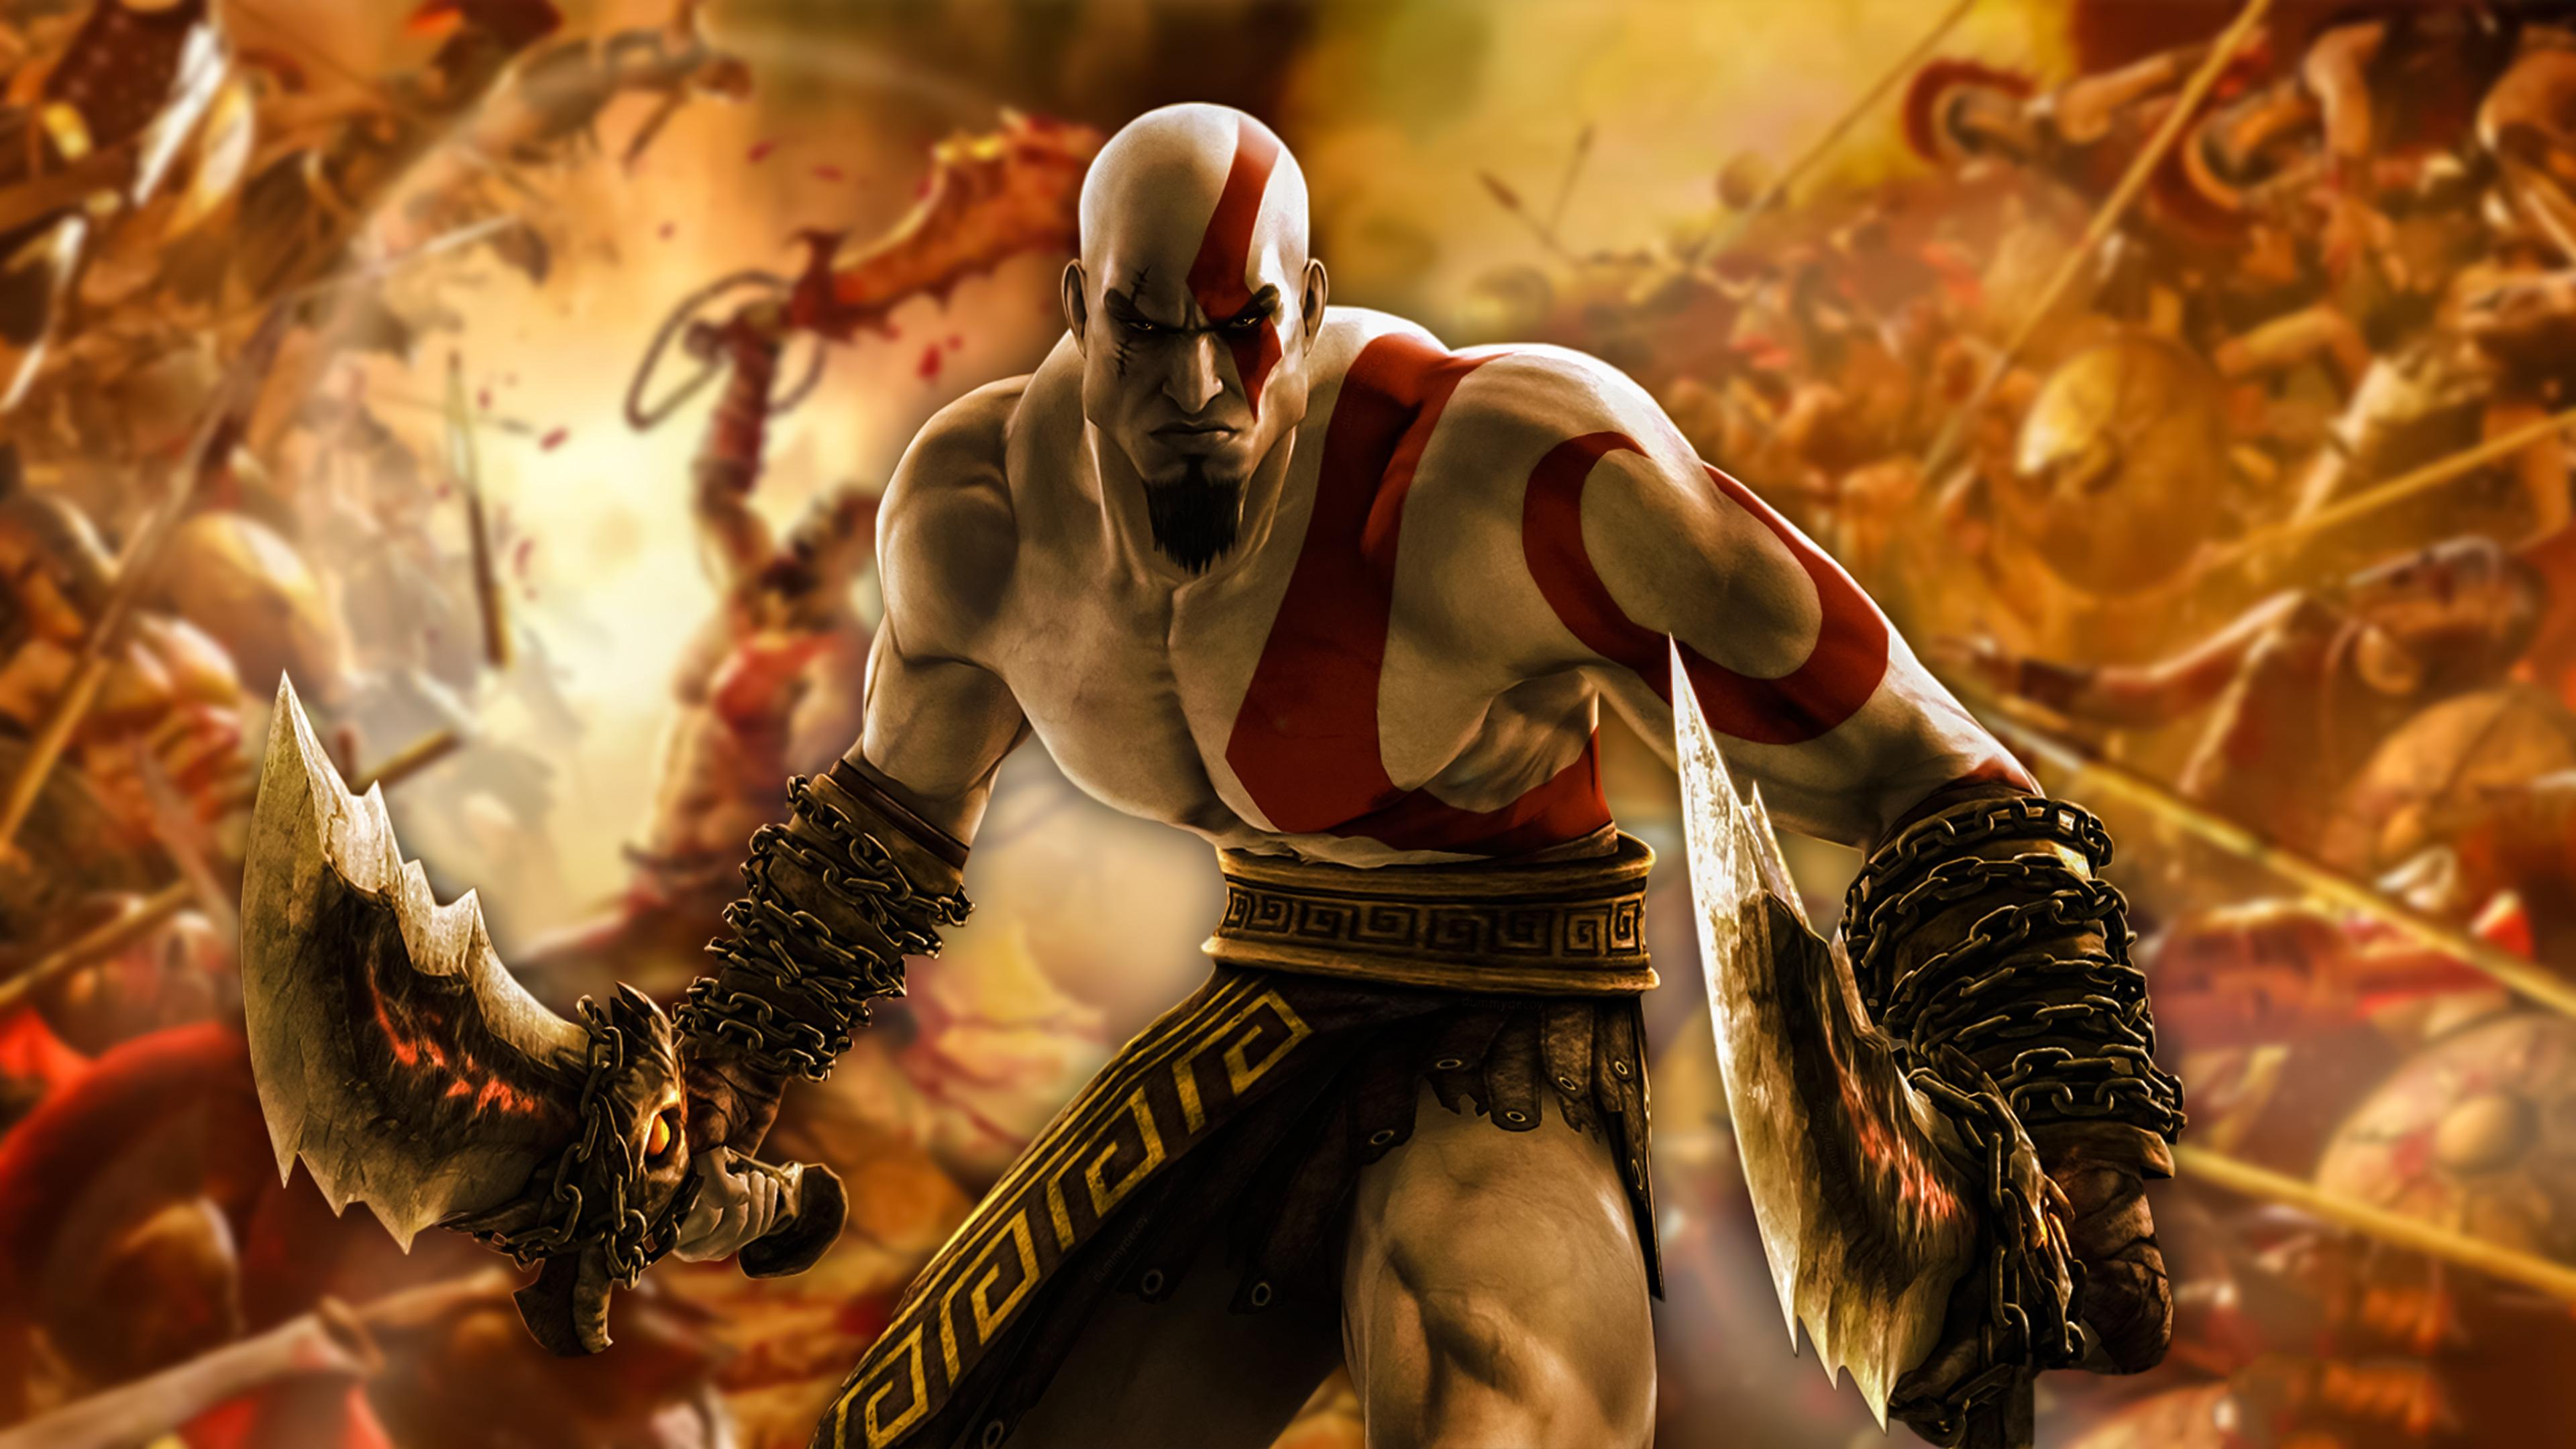 kratos god of war 4k game 1537690478 - Kratos God Of War 4k Game - ps games wallpapers, kratos wallpapers, hd-wallpapers, god of war wallpapers, games wallpapers, 4k-wallpapers